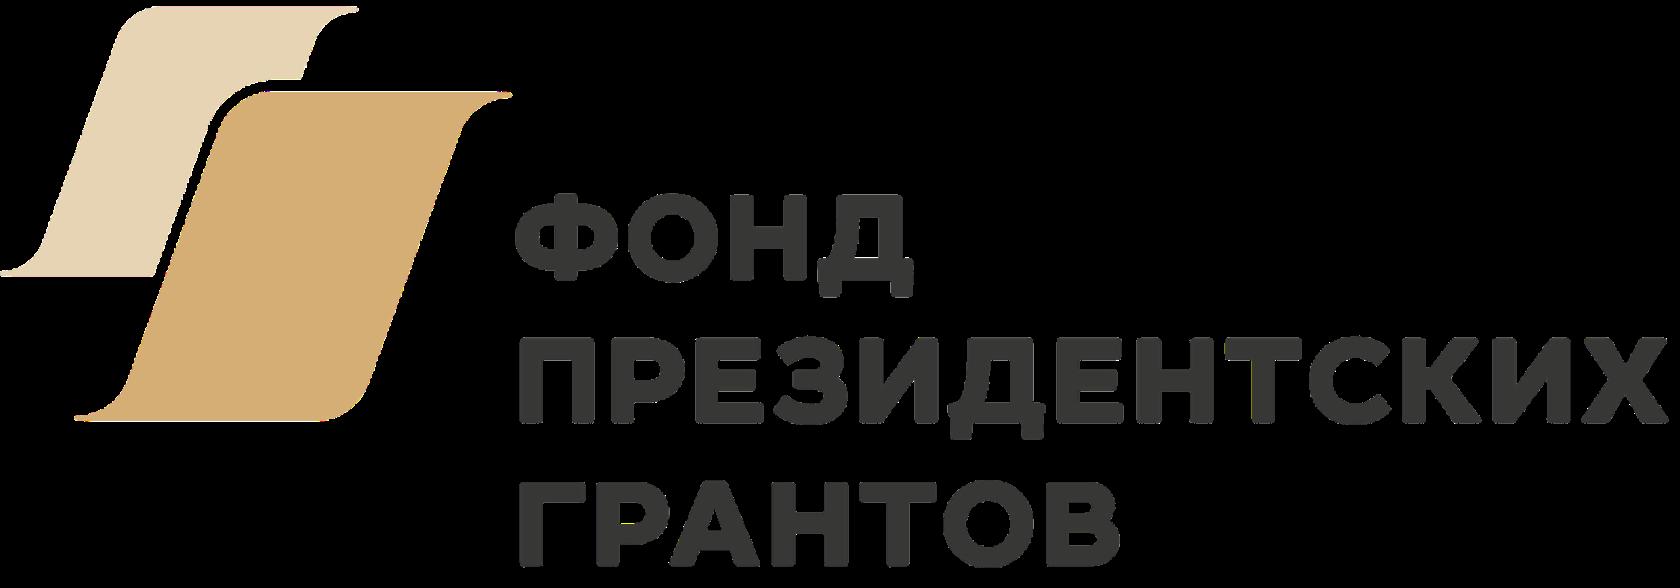 ФПГ, фонд президентских грантов